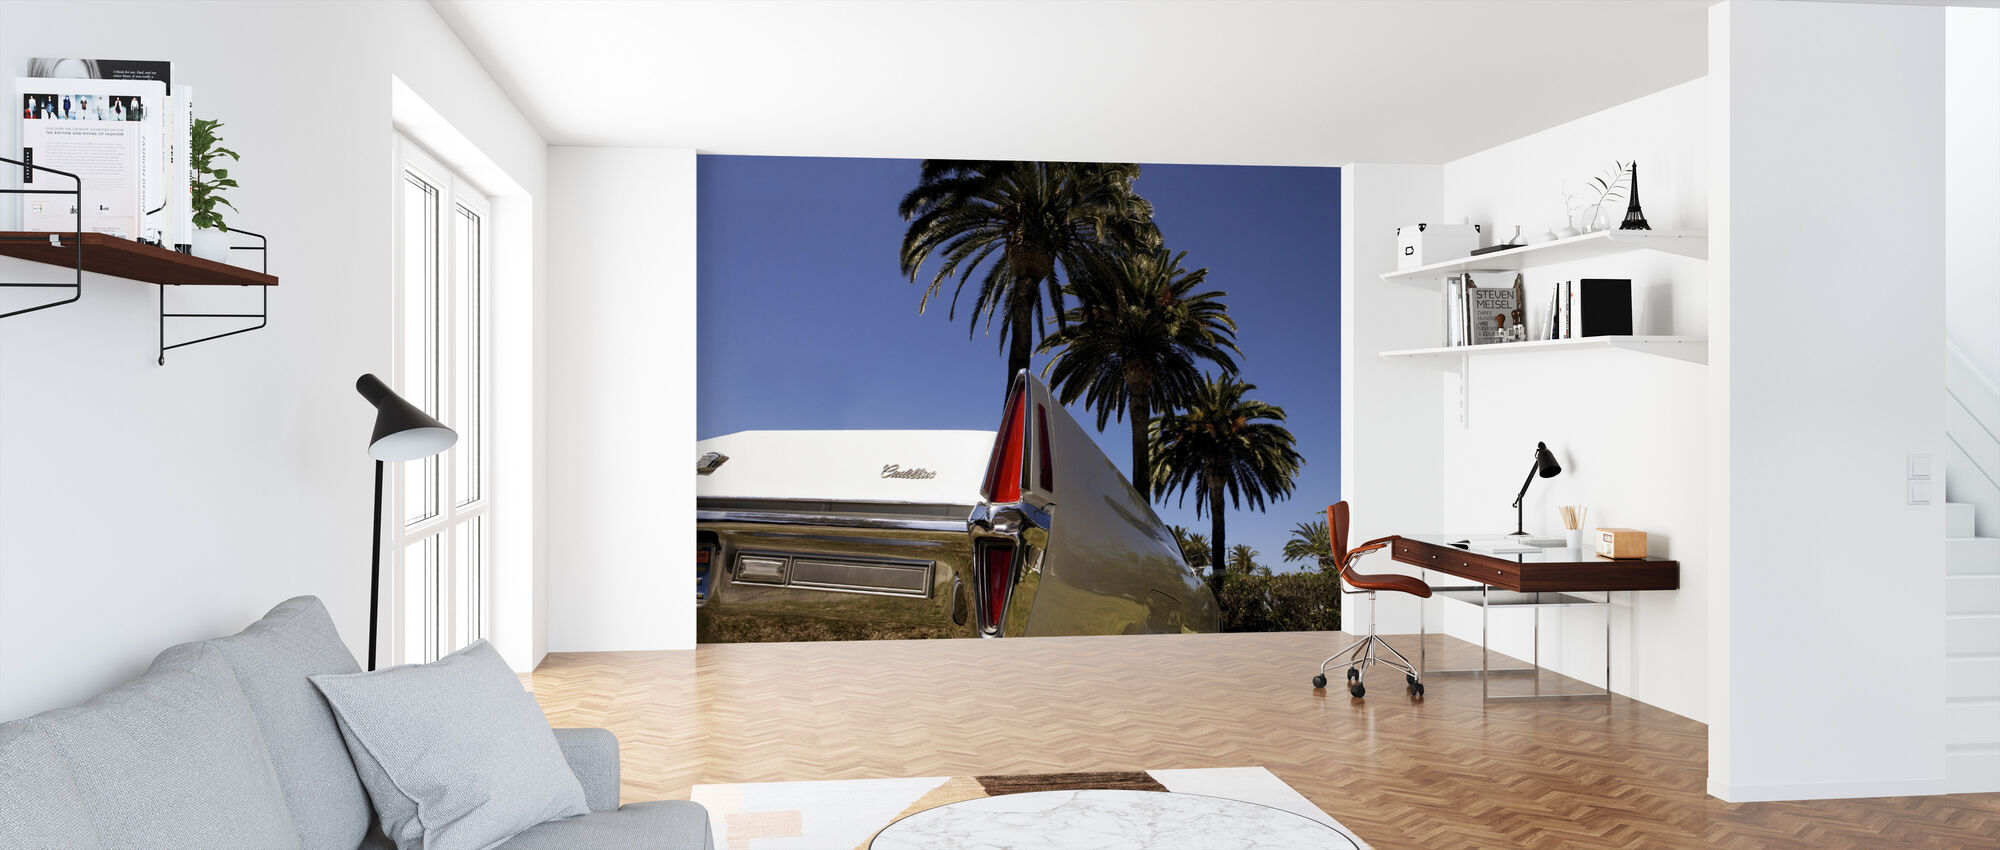 Cadillac - Wallpaper - Office